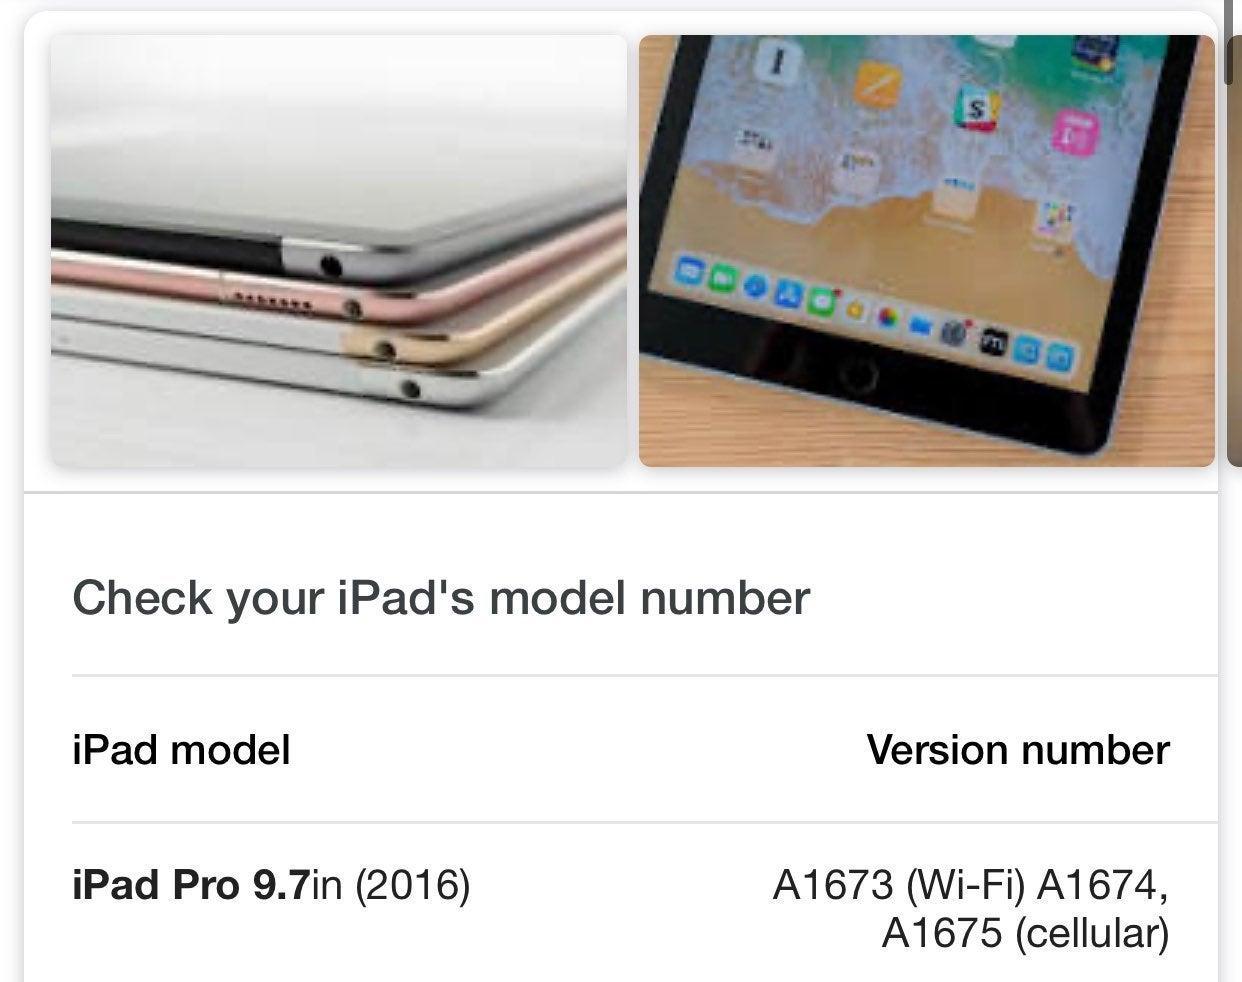 Ipod pro 9.7 apple